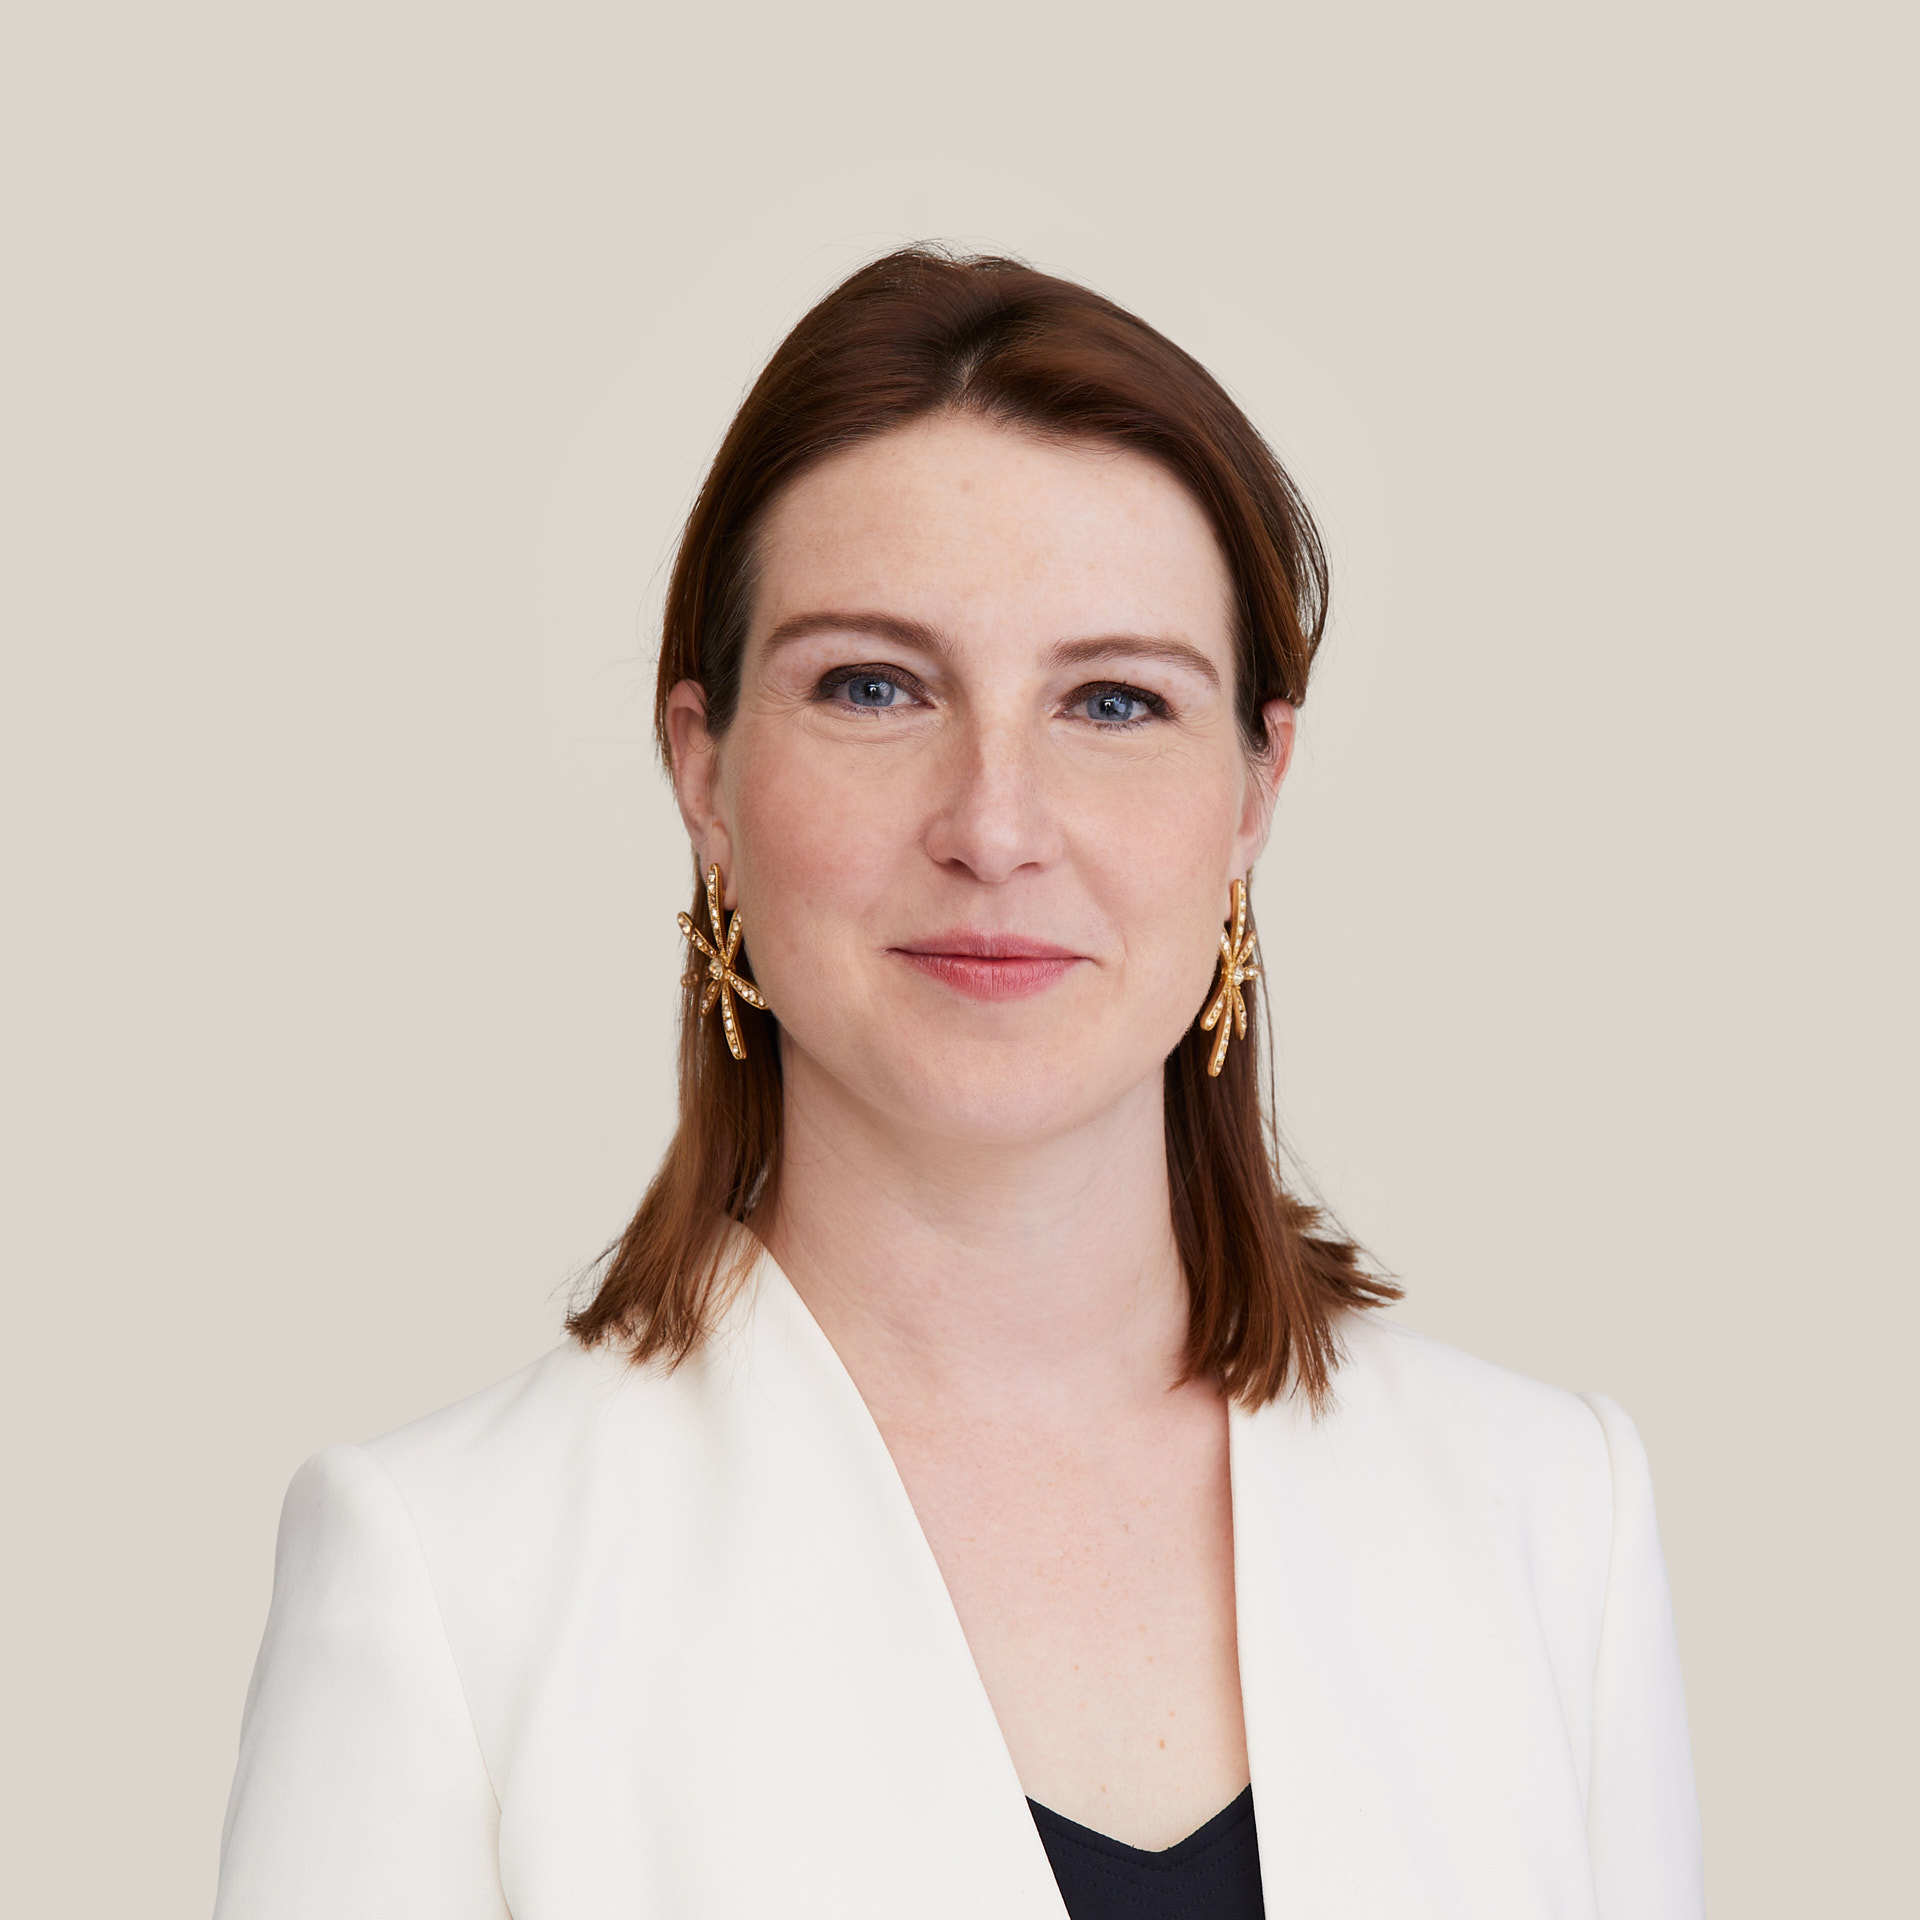 Eva Schram